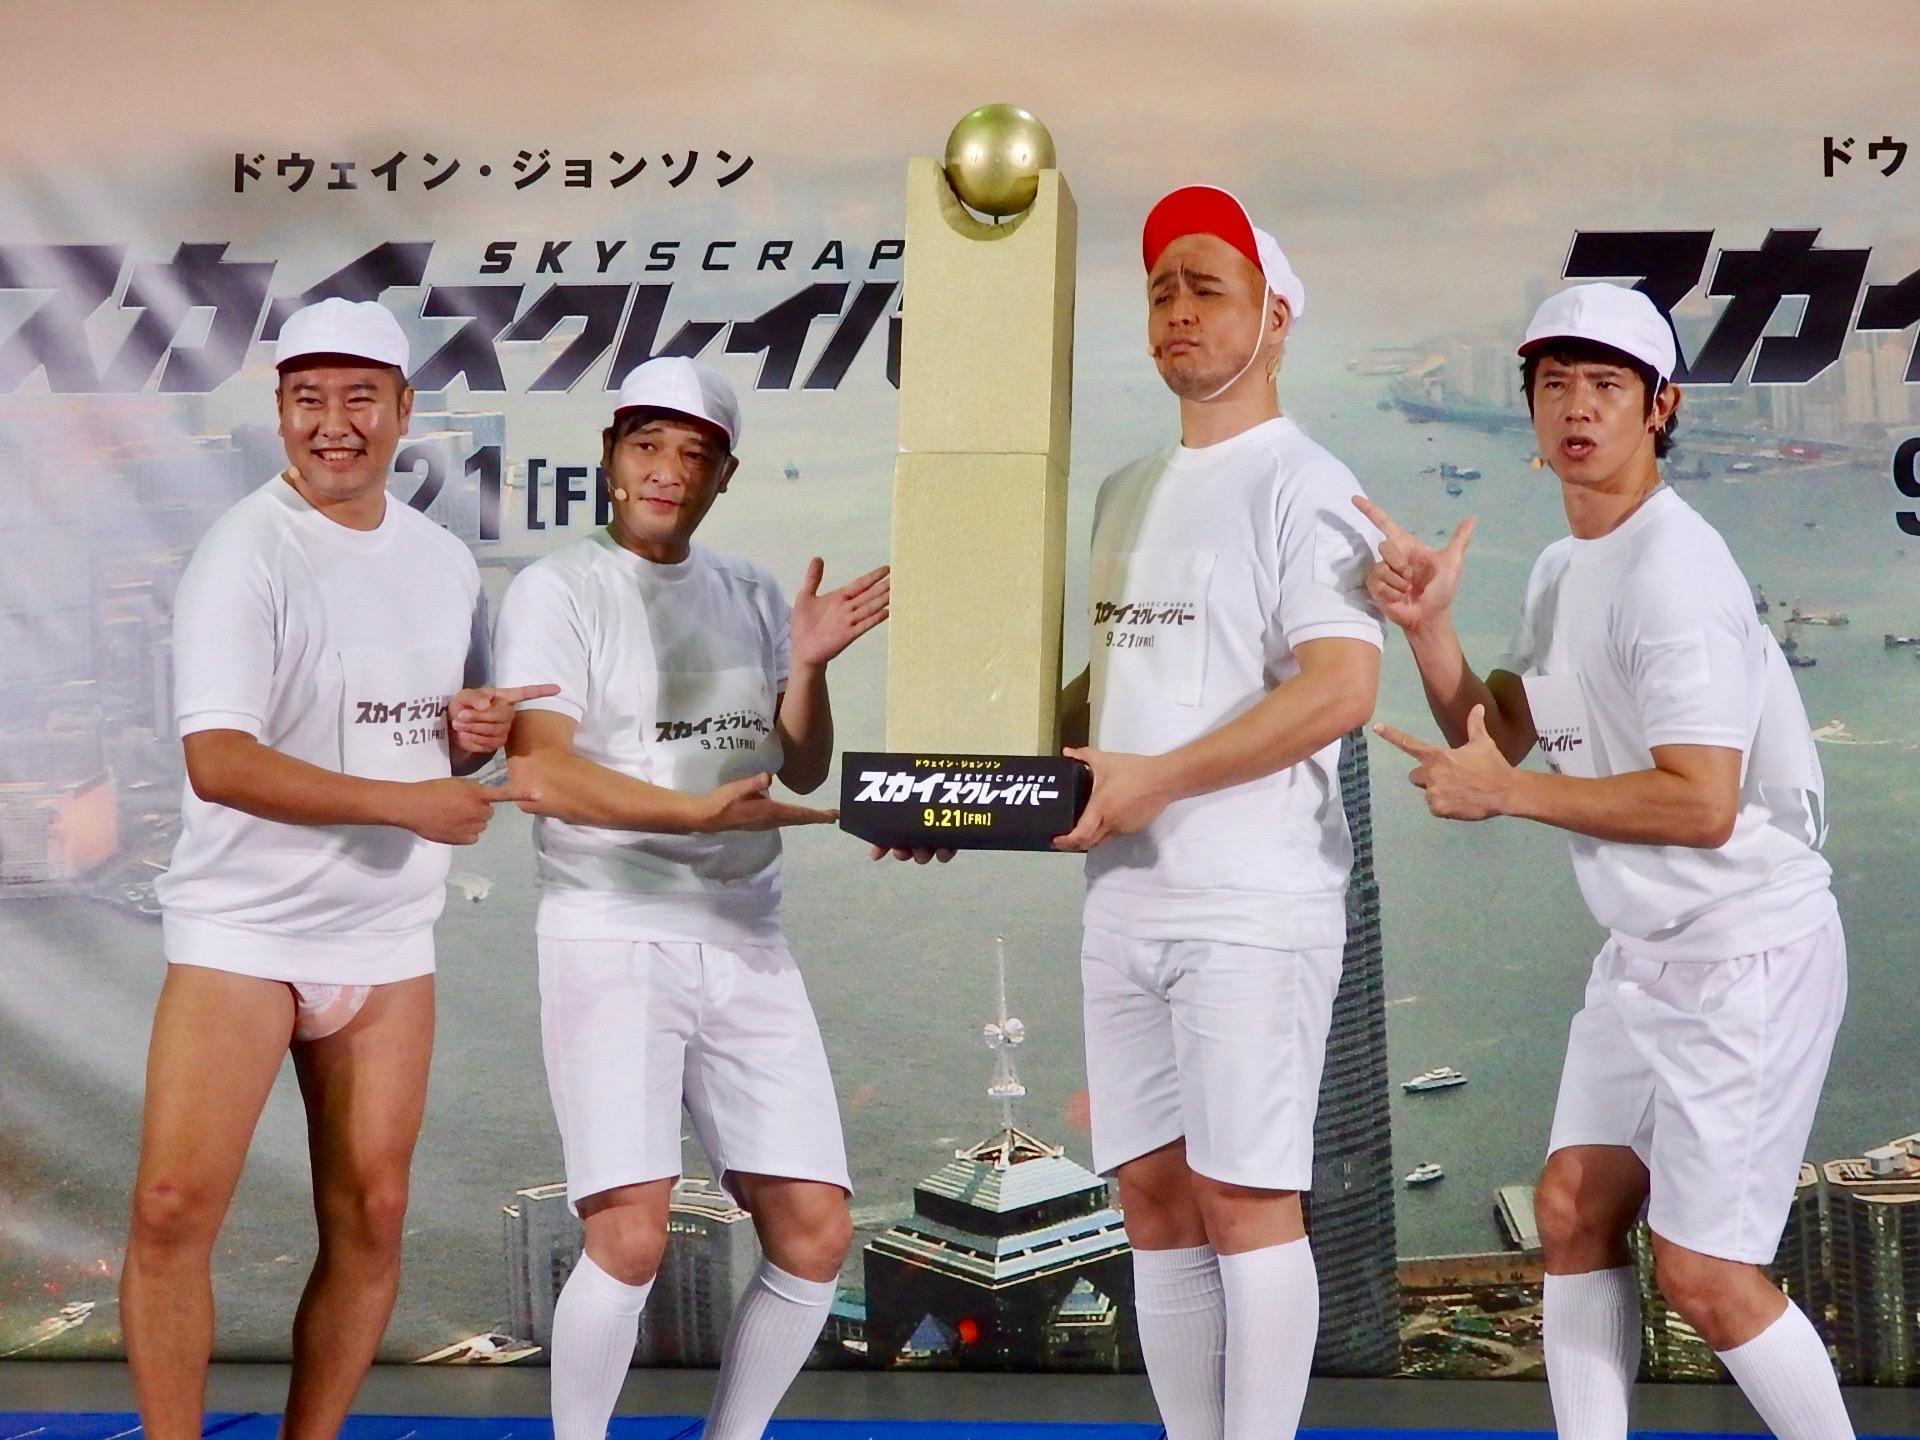 http://news.yoshimoto.co.jp/20180911180241-7842fa86309b0e34b66061a53242ae6a52993744.jpg